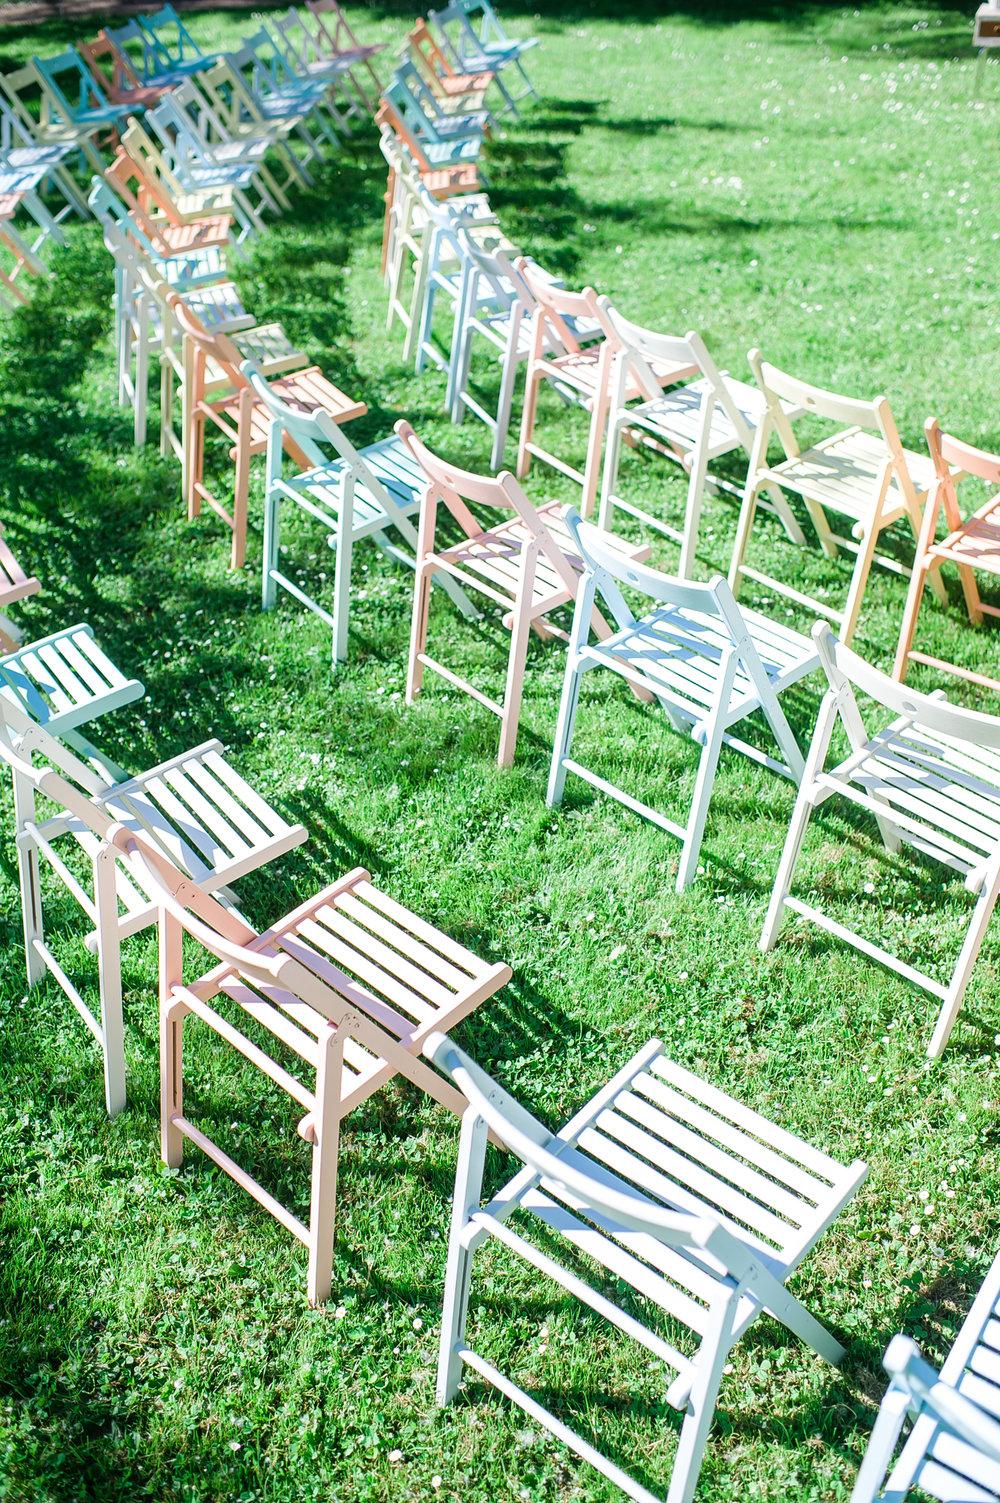 AdobeBridgeBatchRenameTemp12Britta Schunck Photography_bohowedding_gardenwedding.jpg